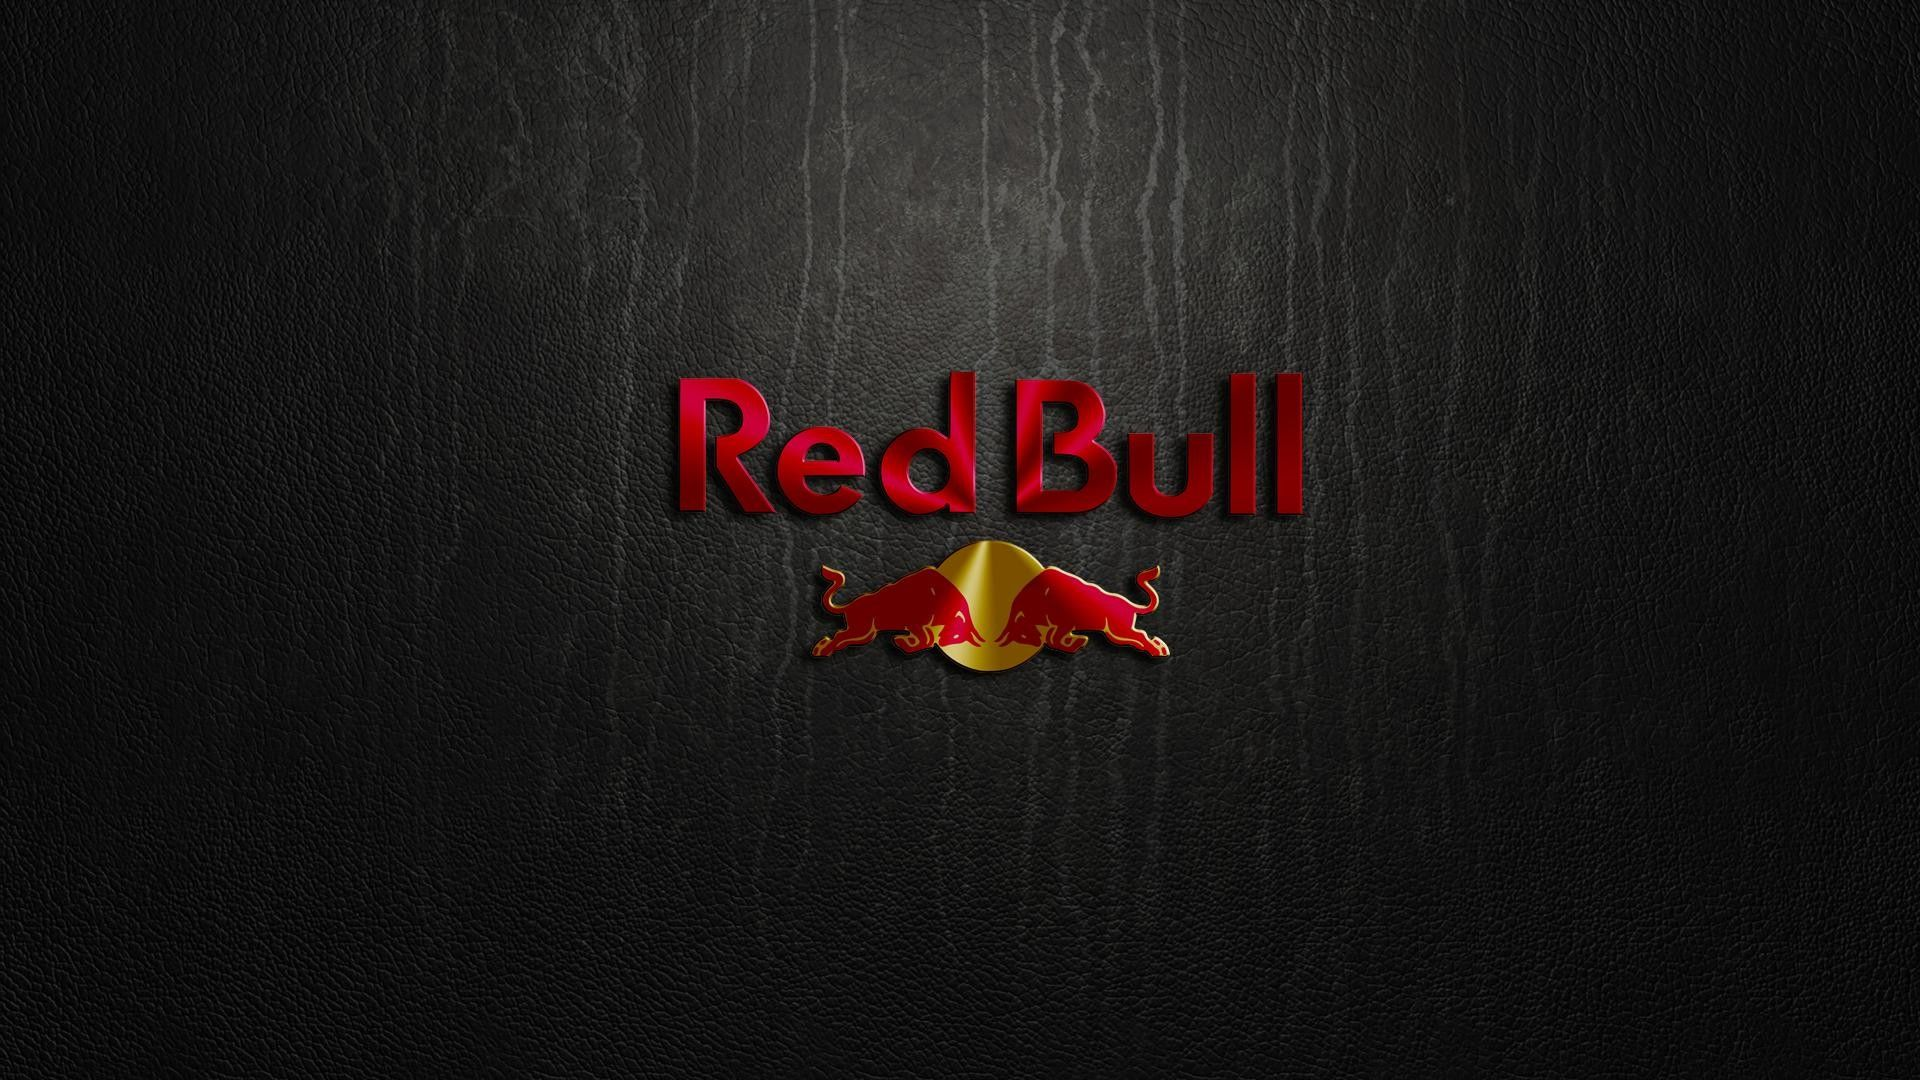 1920x1080 Red Bull Logo Wallpaper Hd Logo Wallpaper Hd Bull